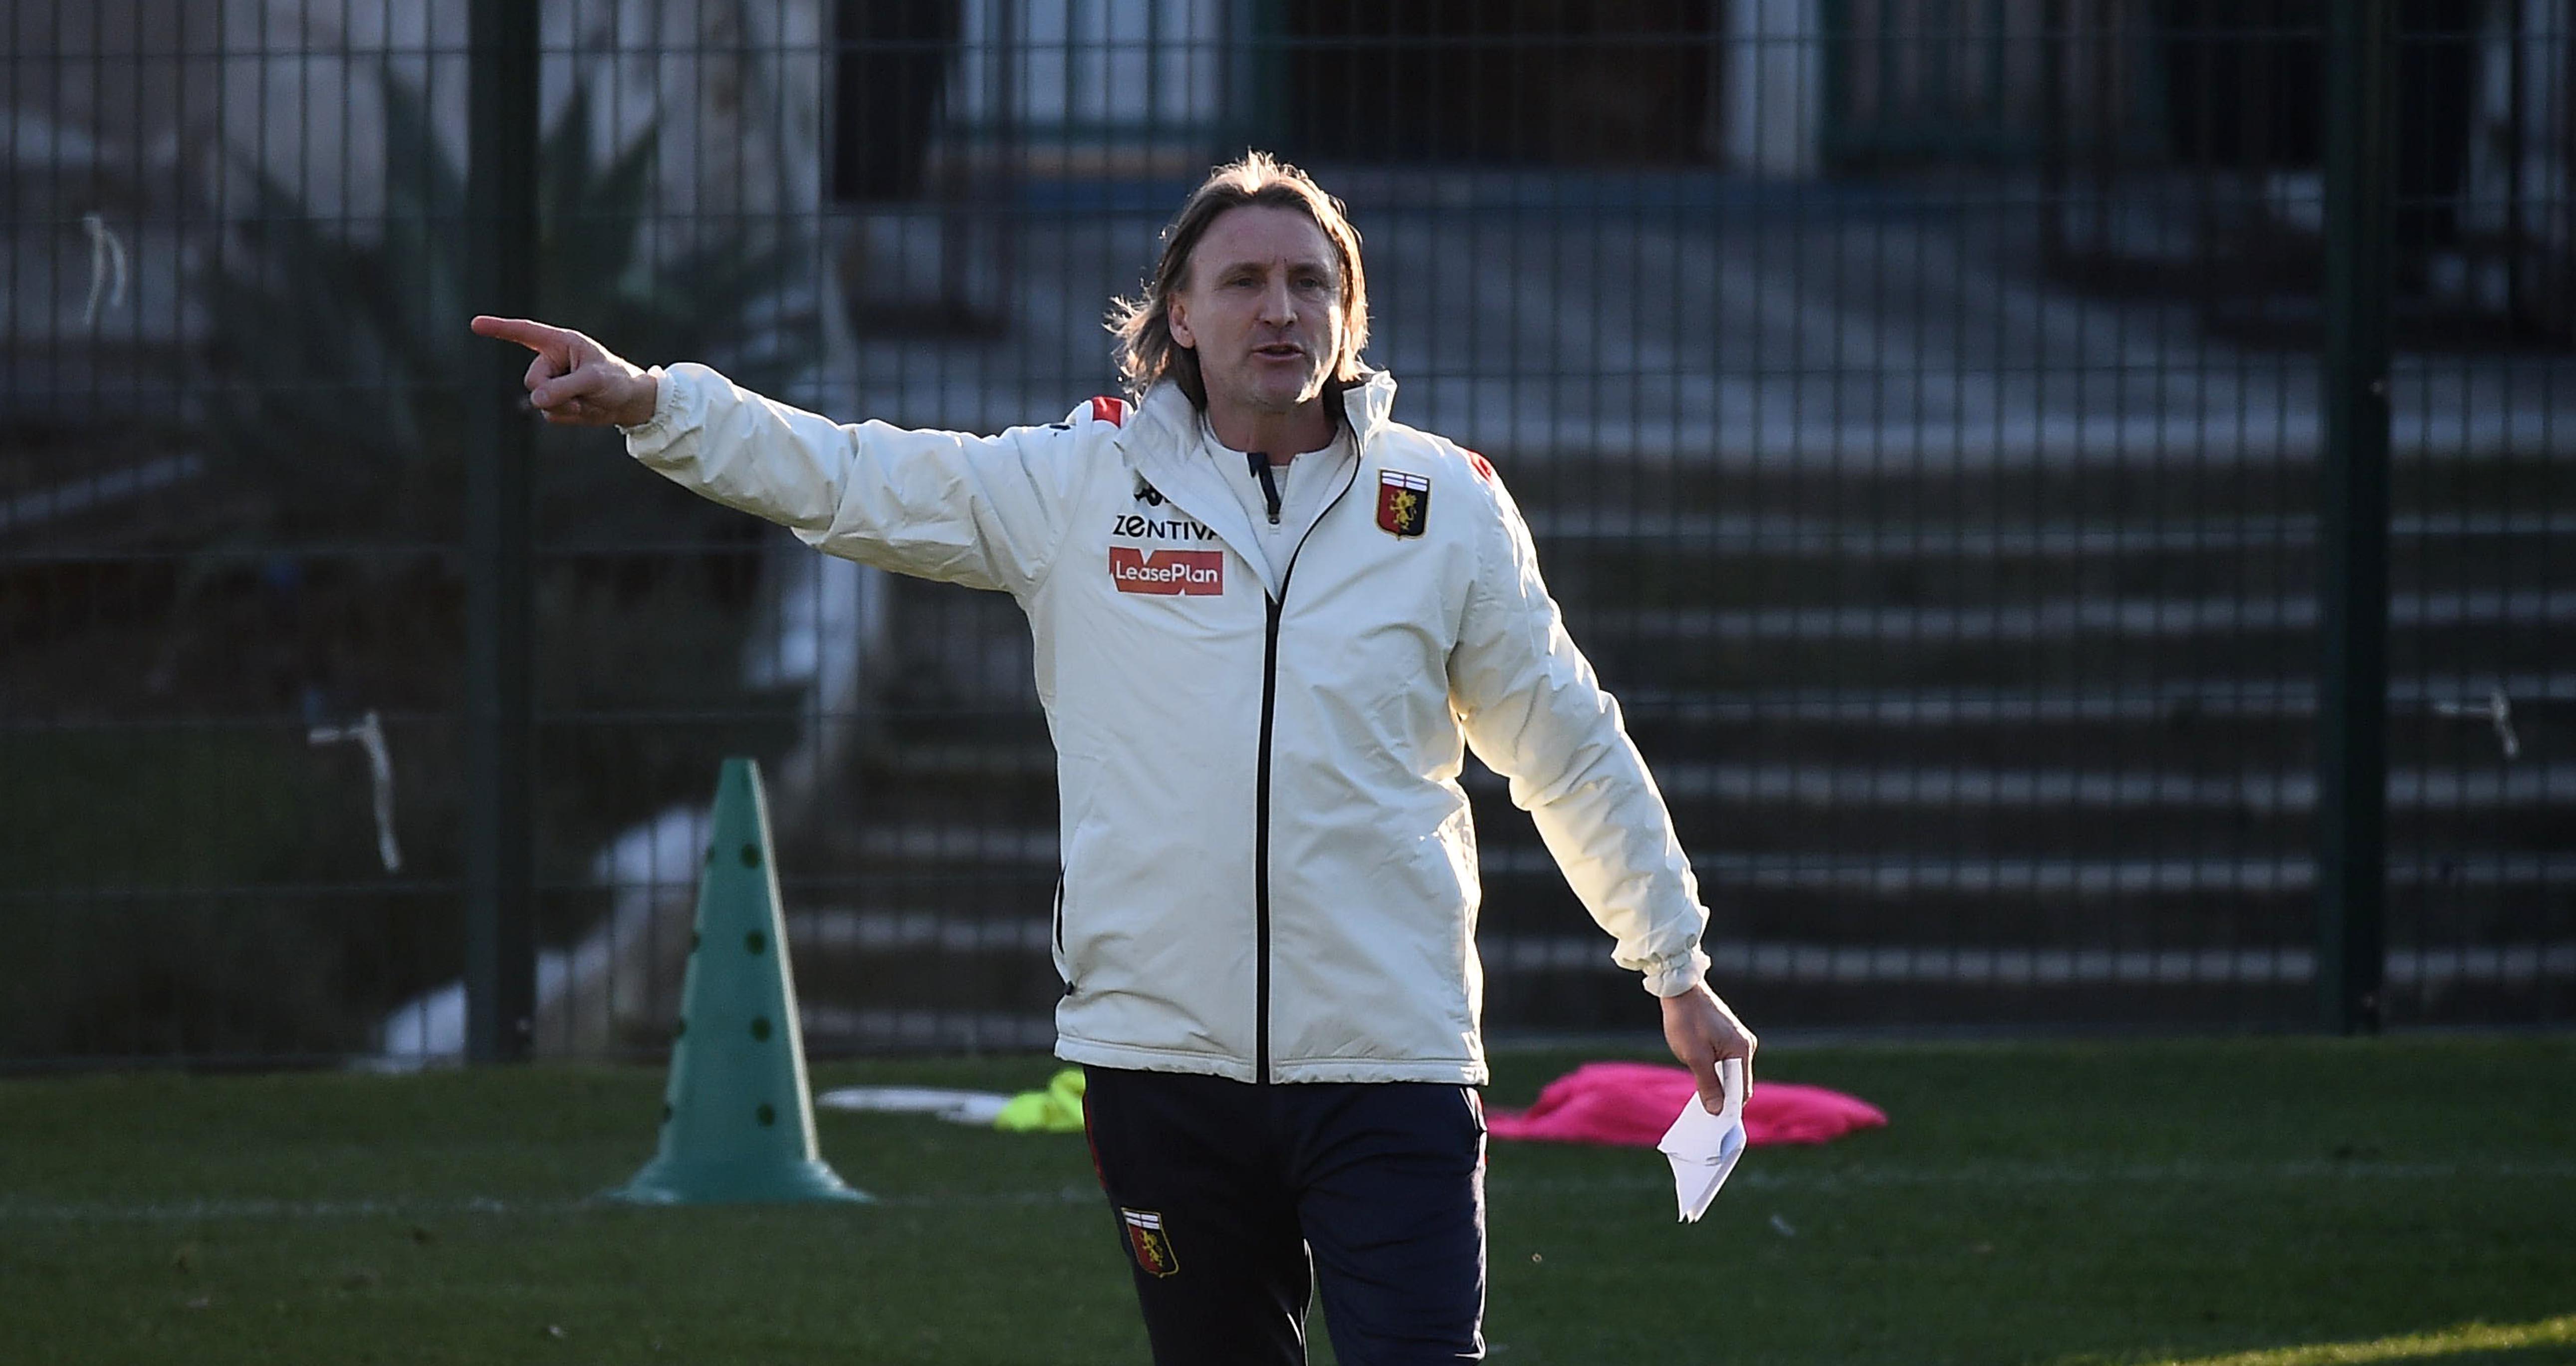 Nicola Genoa